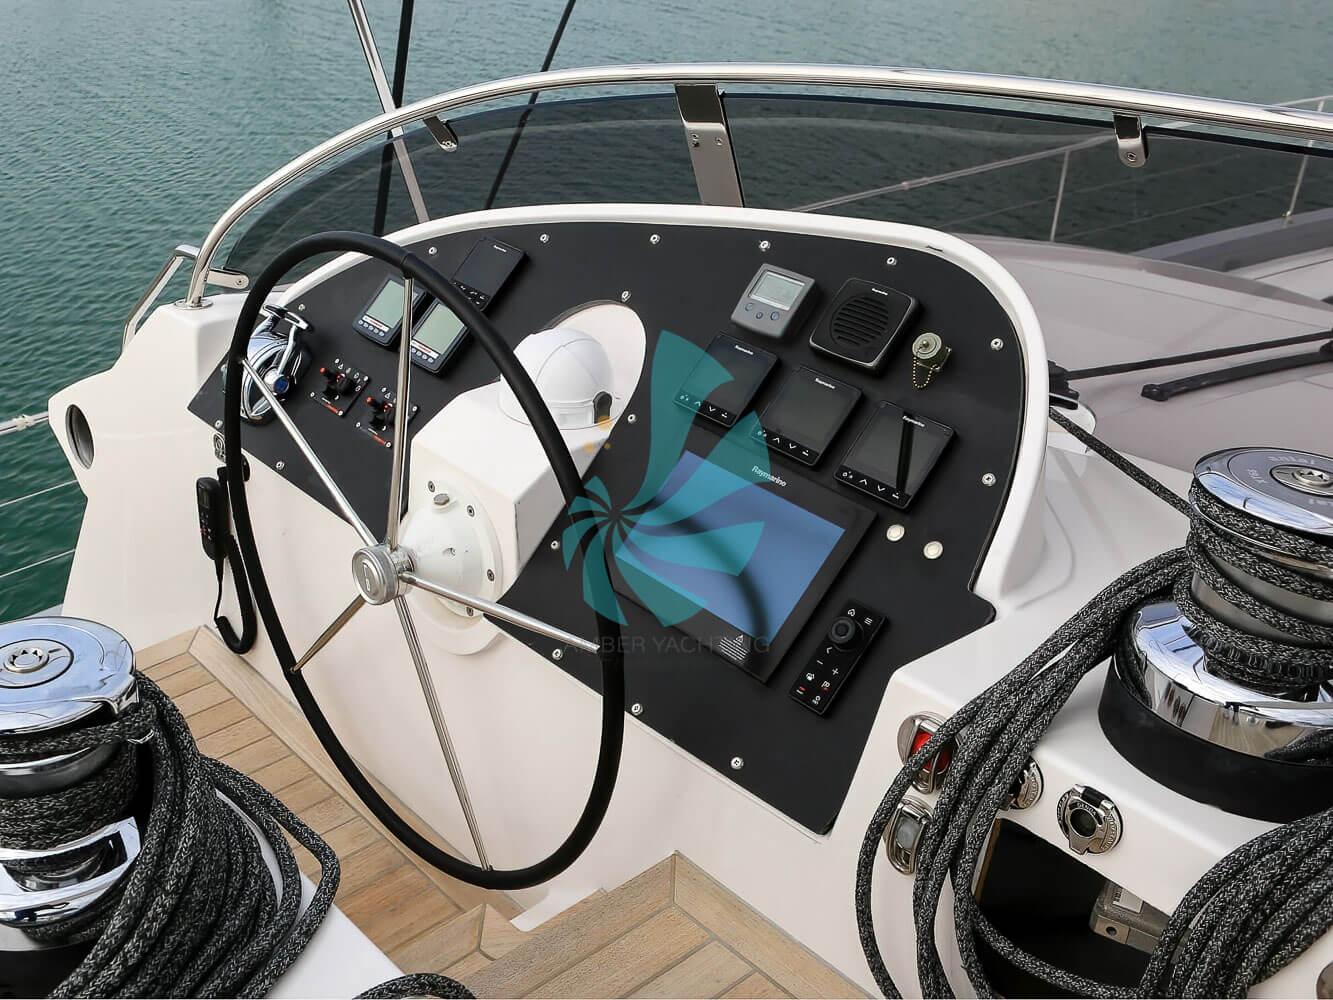 Sailing Catamaran Privilege Série 6 pilot house, for sale www.amber-yachting.com